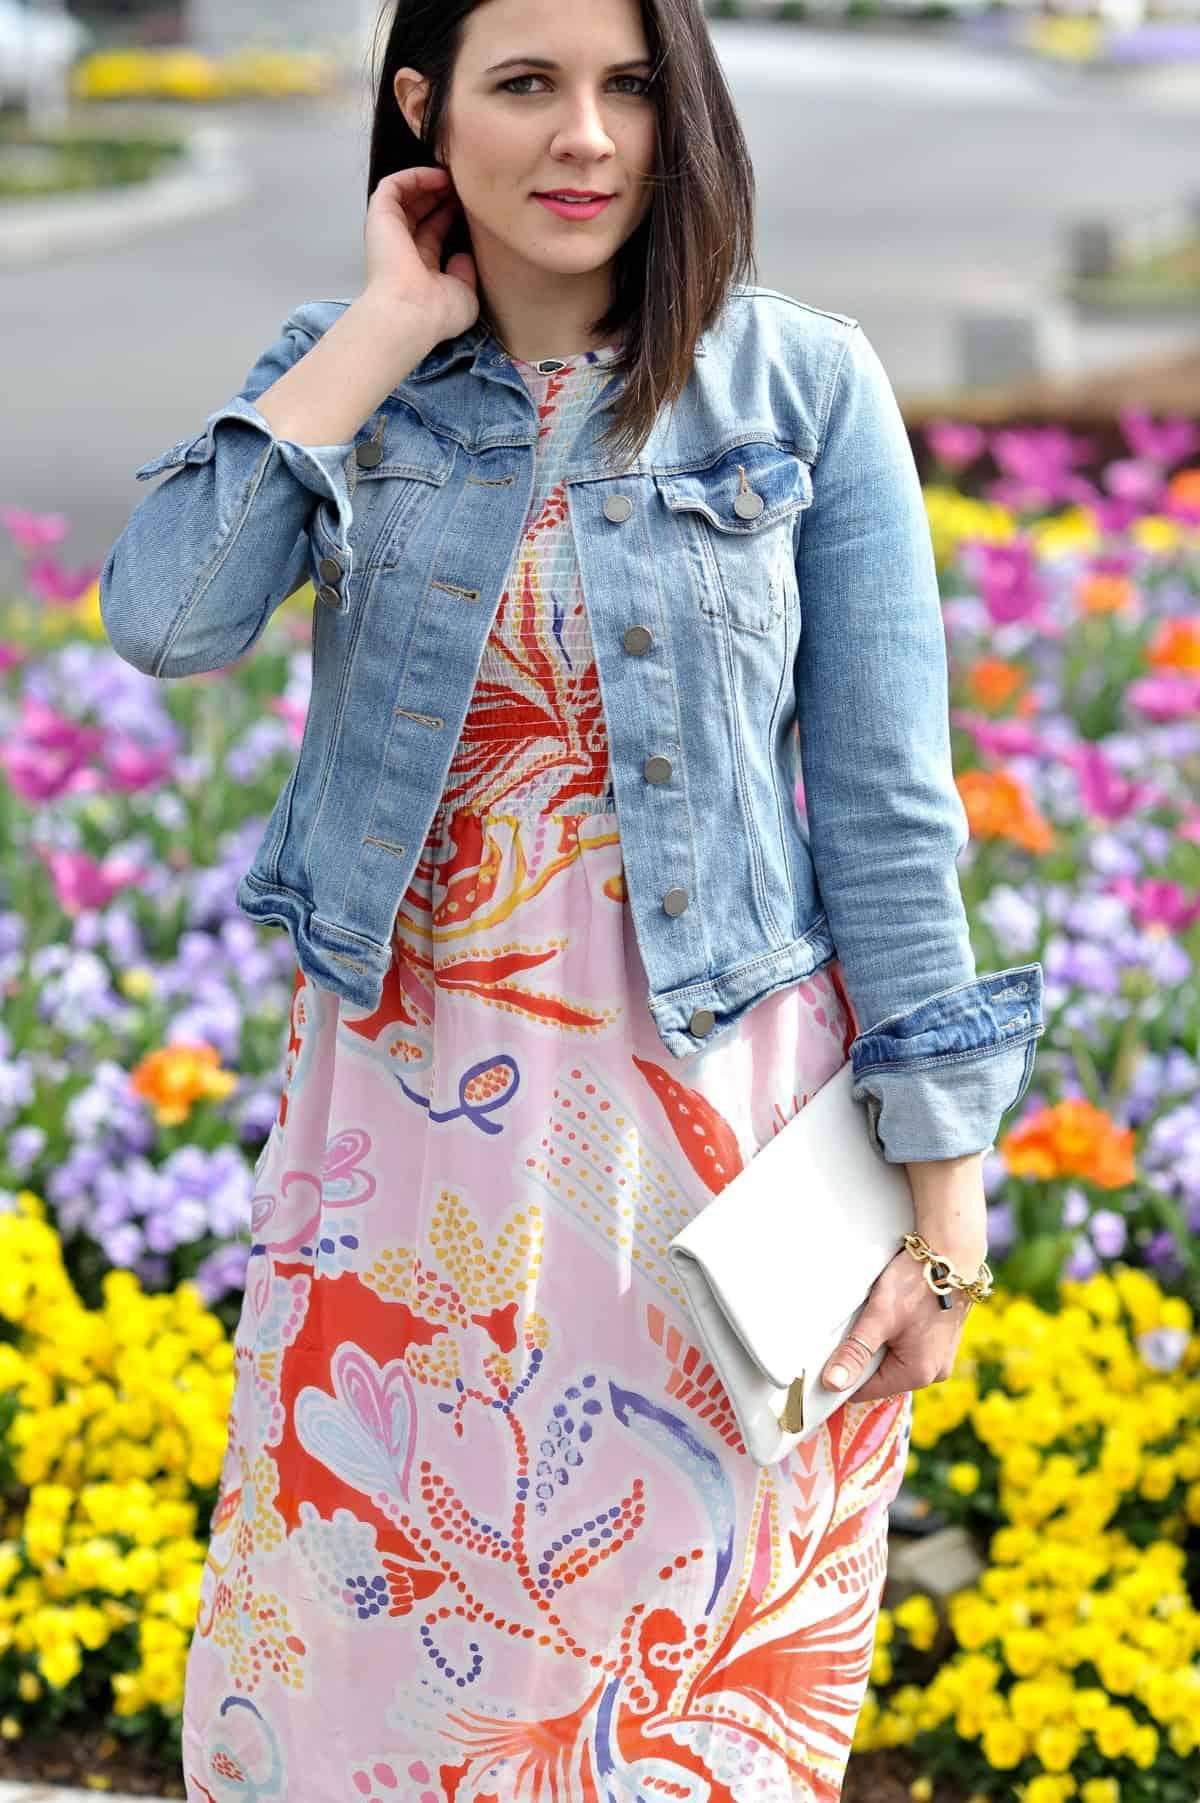 Banjanan Cochella Dress - printed floral dress for summer - My Style Vita - @mystylevita - 10